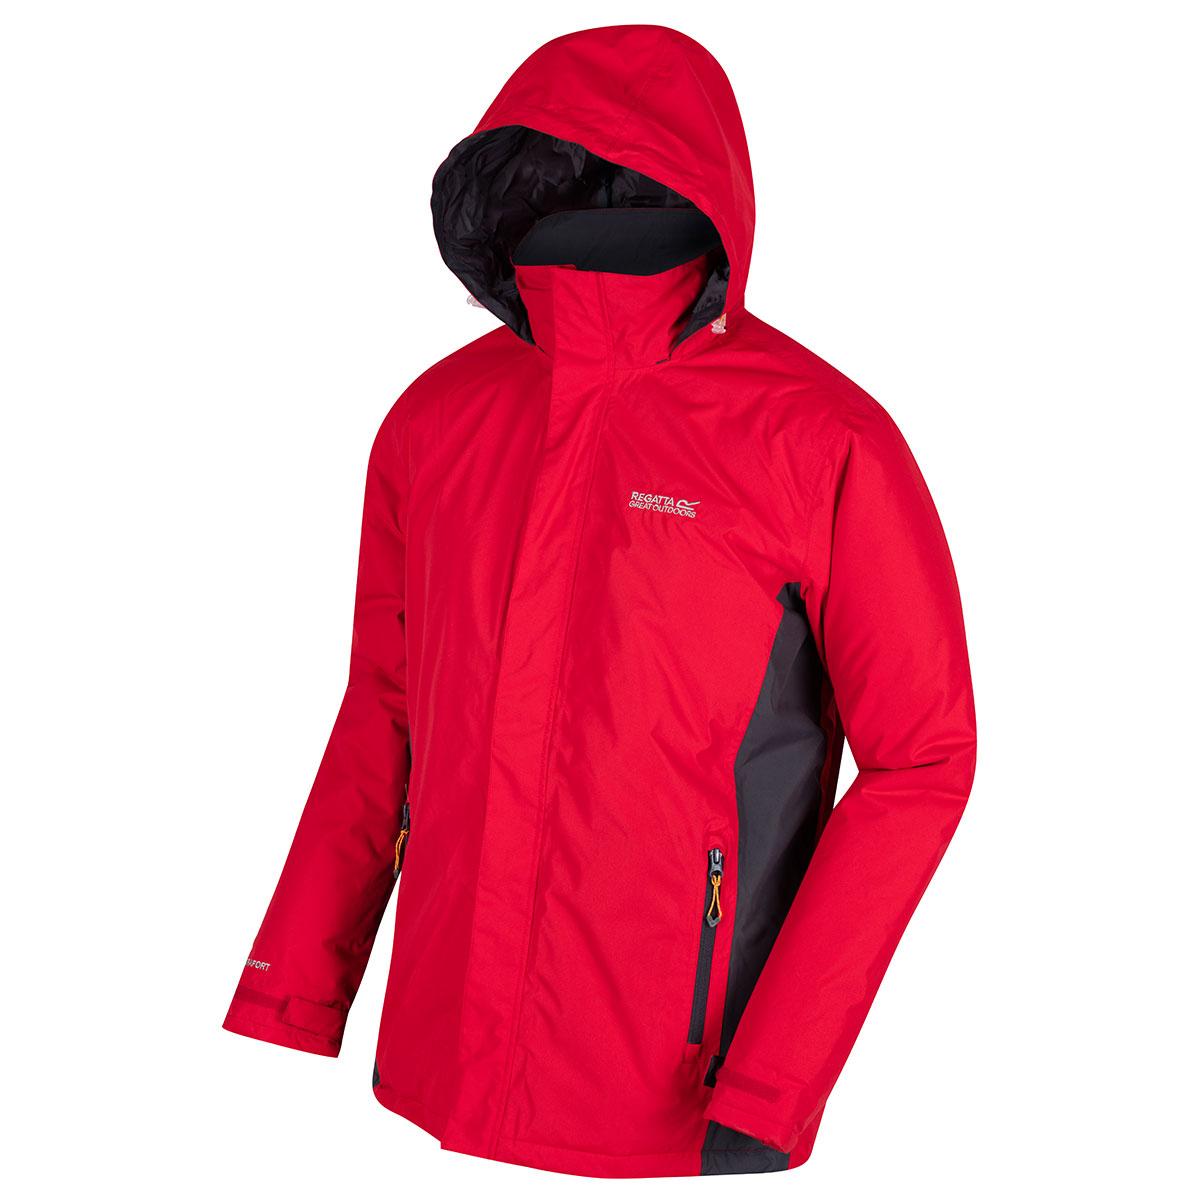 Regatta-Mens-Thornridge-Thermal-Waterproof-Jacket-69-OFF-RRP thumbnail 12